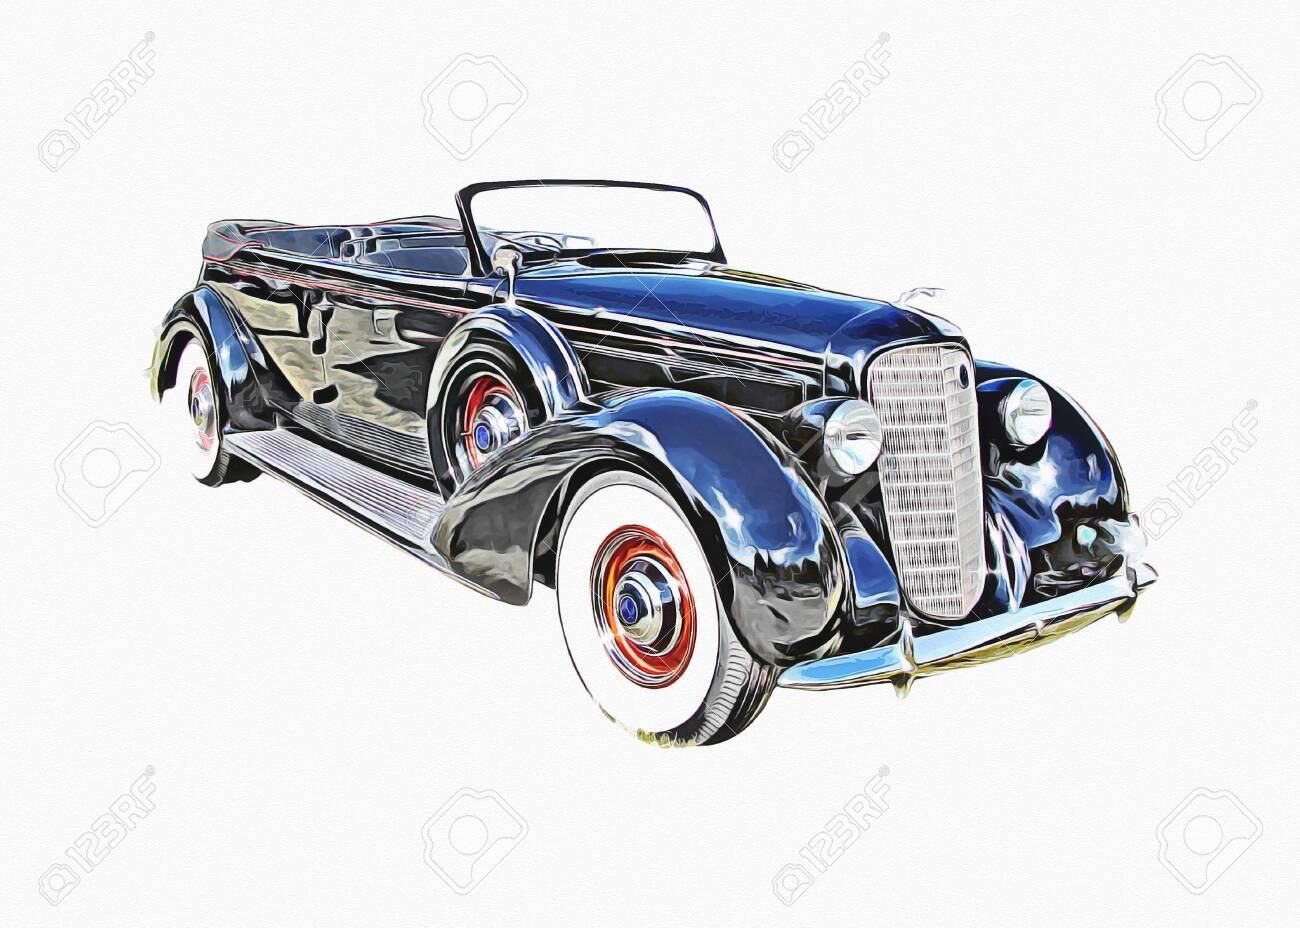 Vintage Retro Classic Old Car Illustration - 150691758